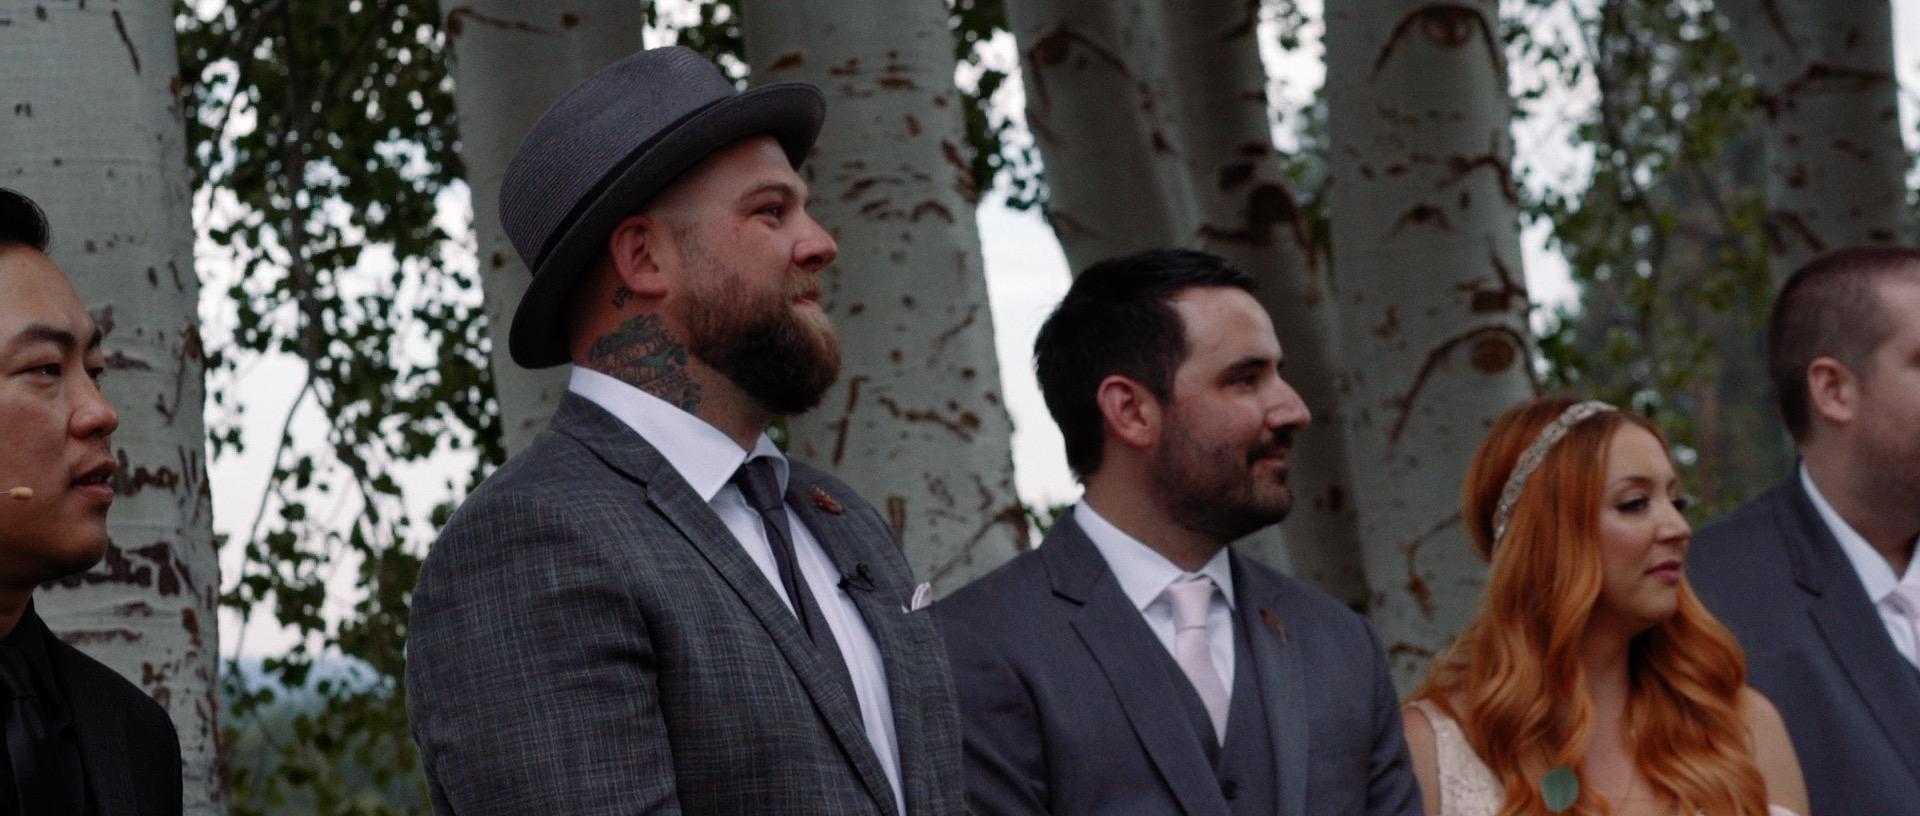 Black Butte Ranch Wedding 6.jpg